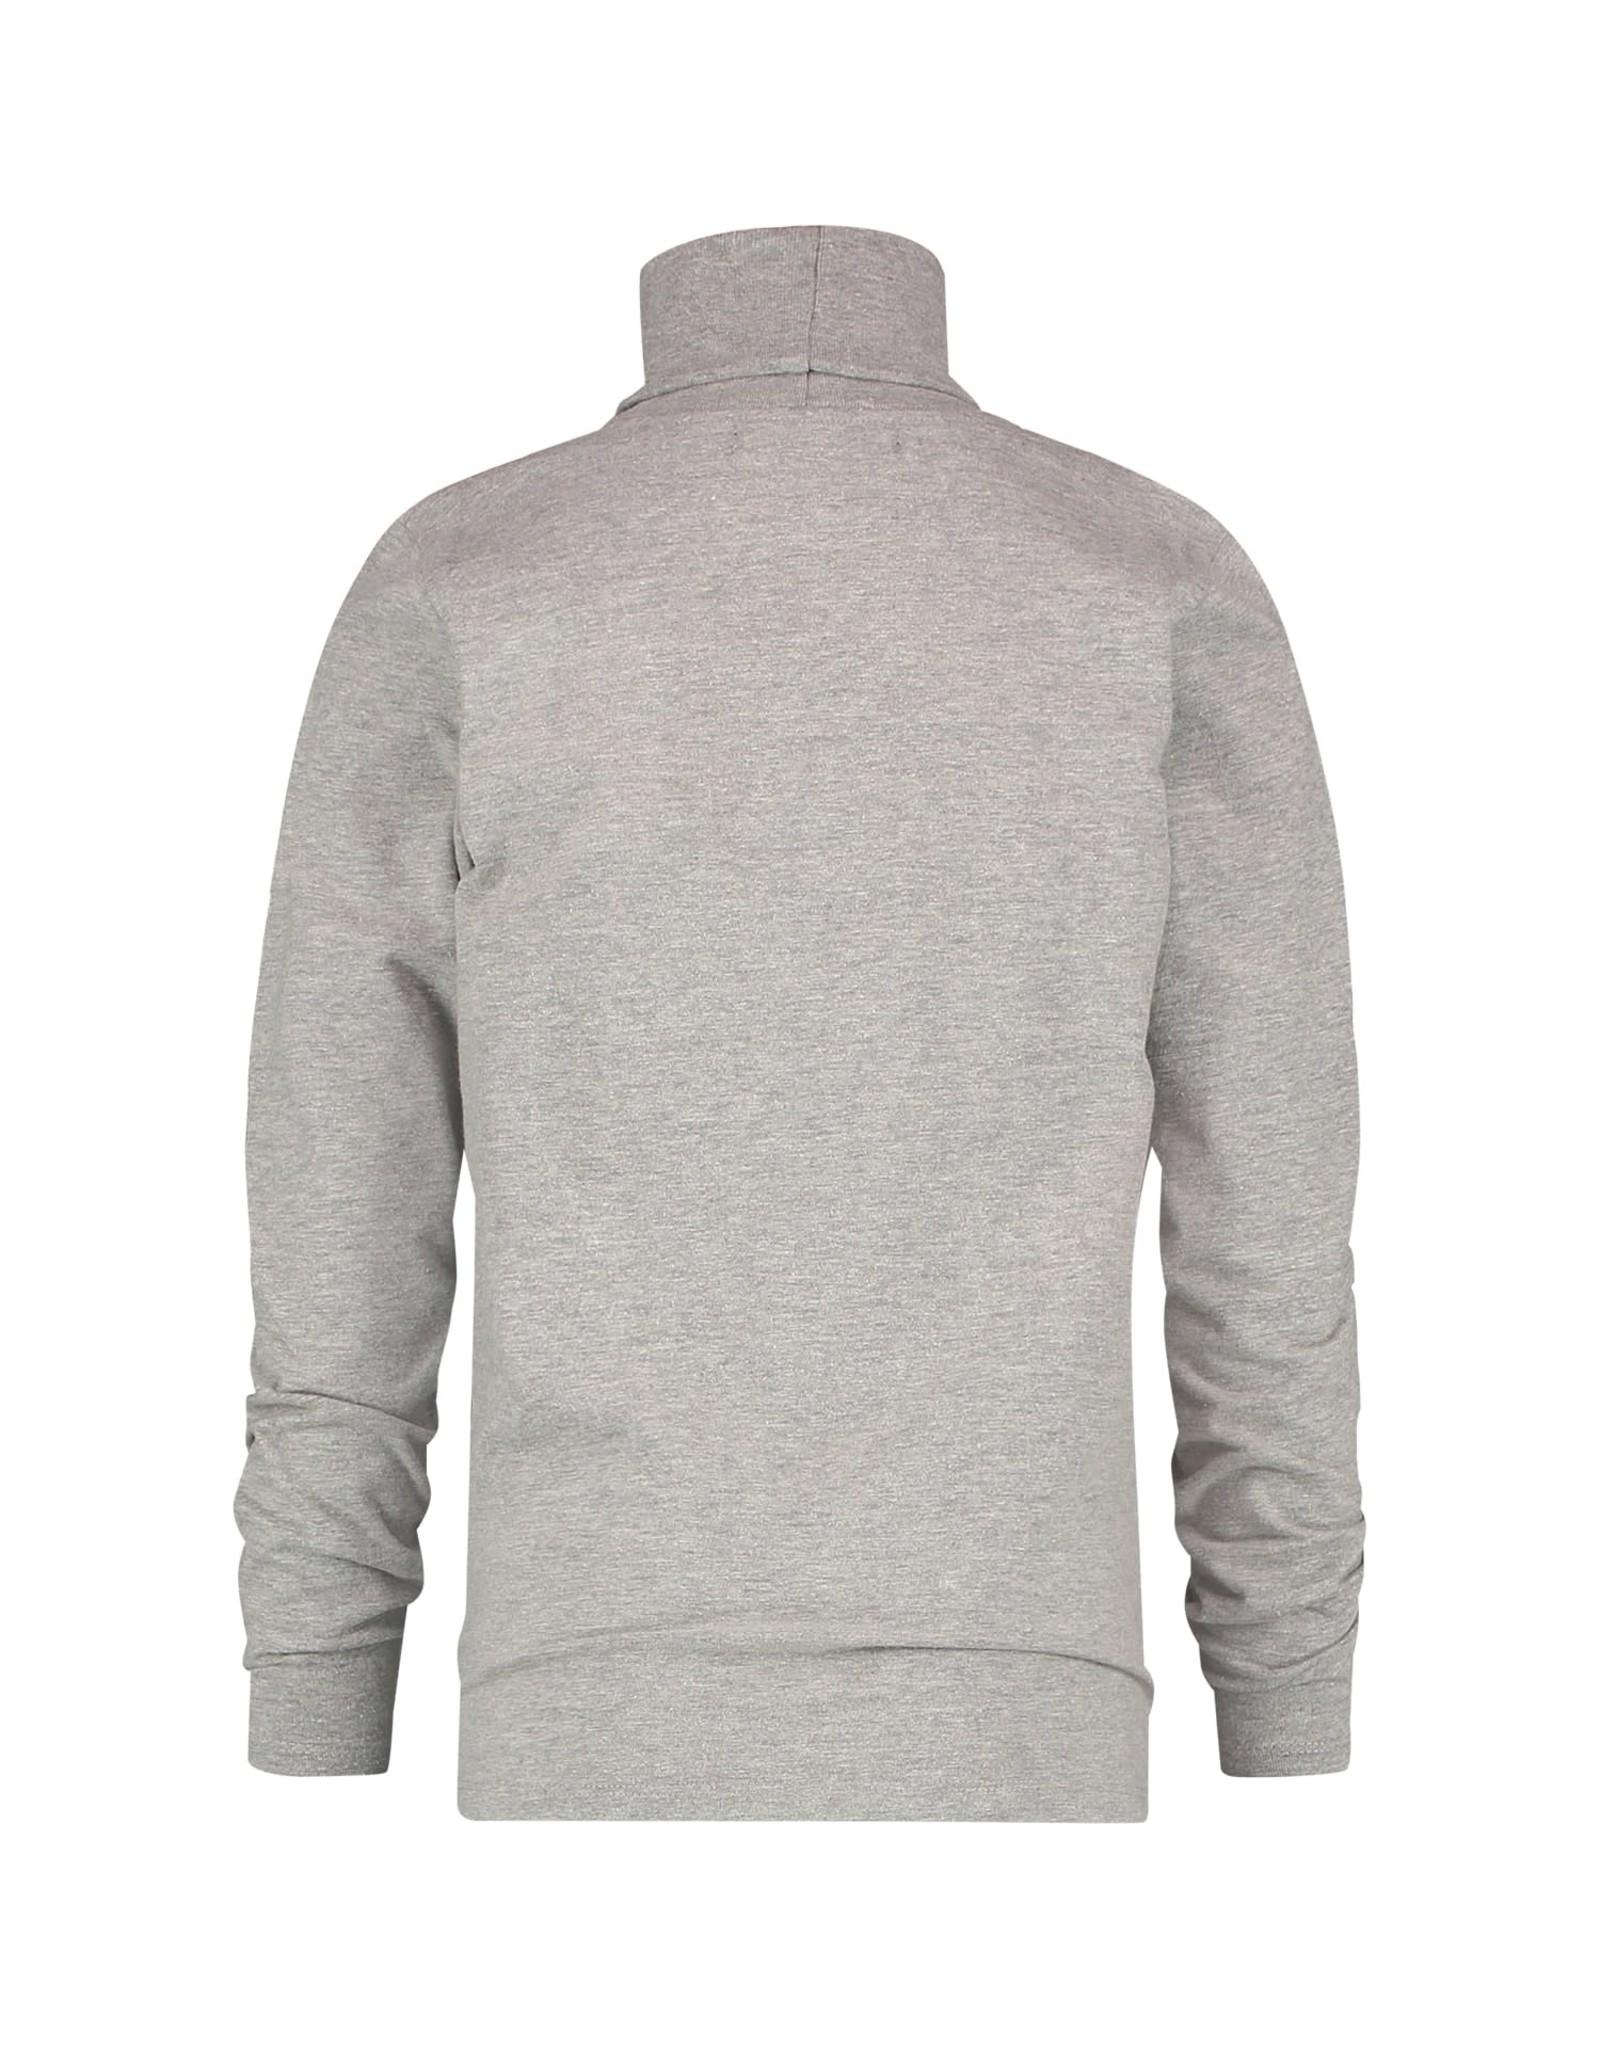 Vingino Vingino jongens coll shirt Jace Grey Mele